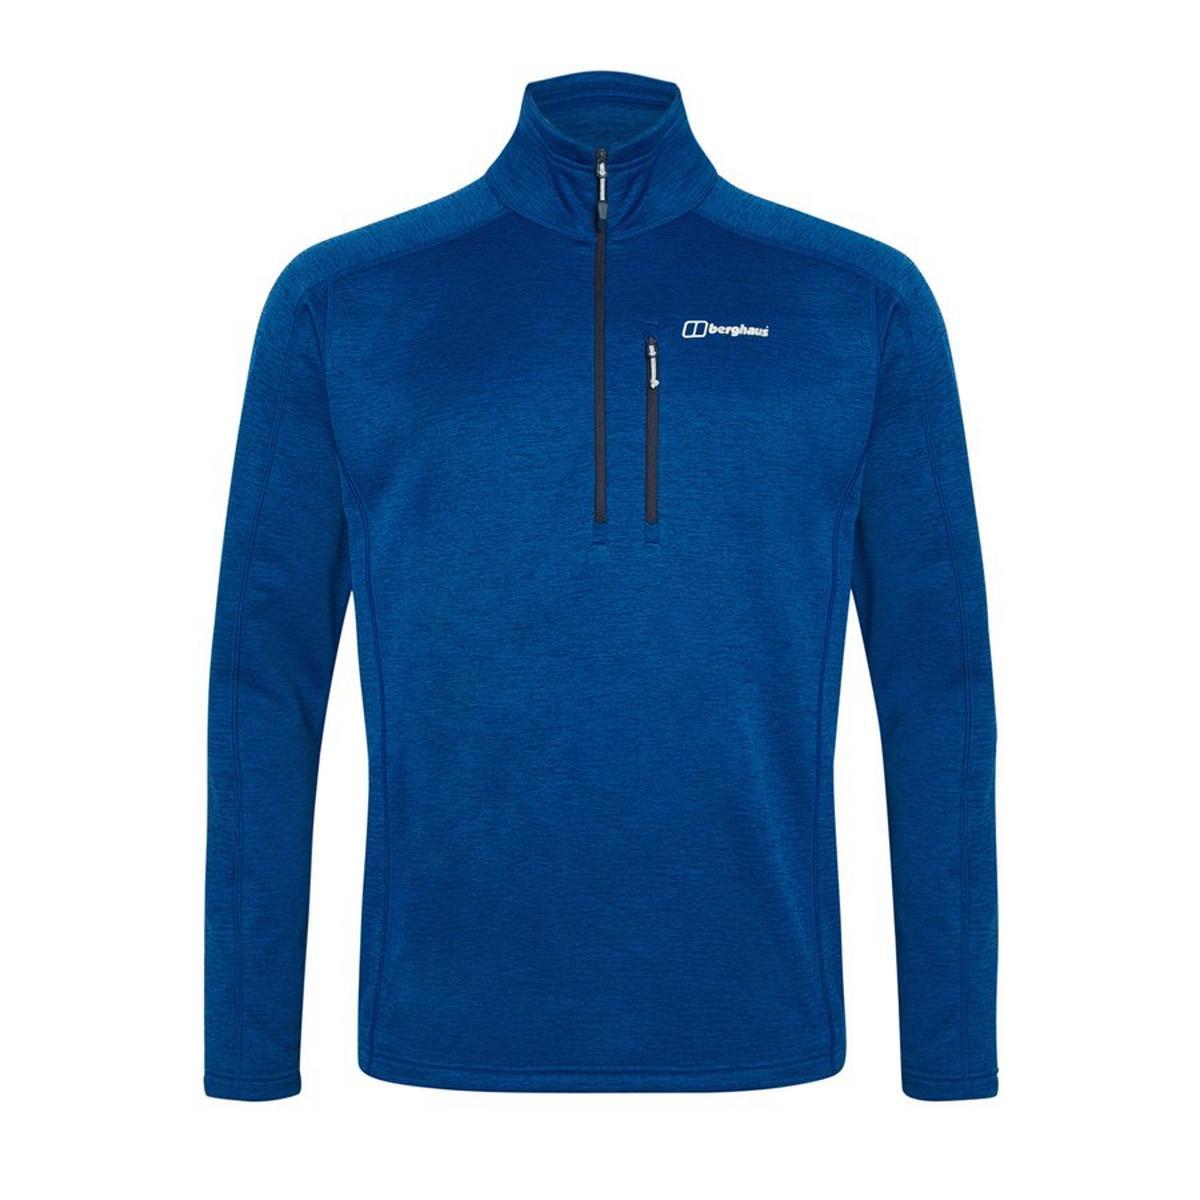 Berghaus Men's Spitzer Half Zip - Blue